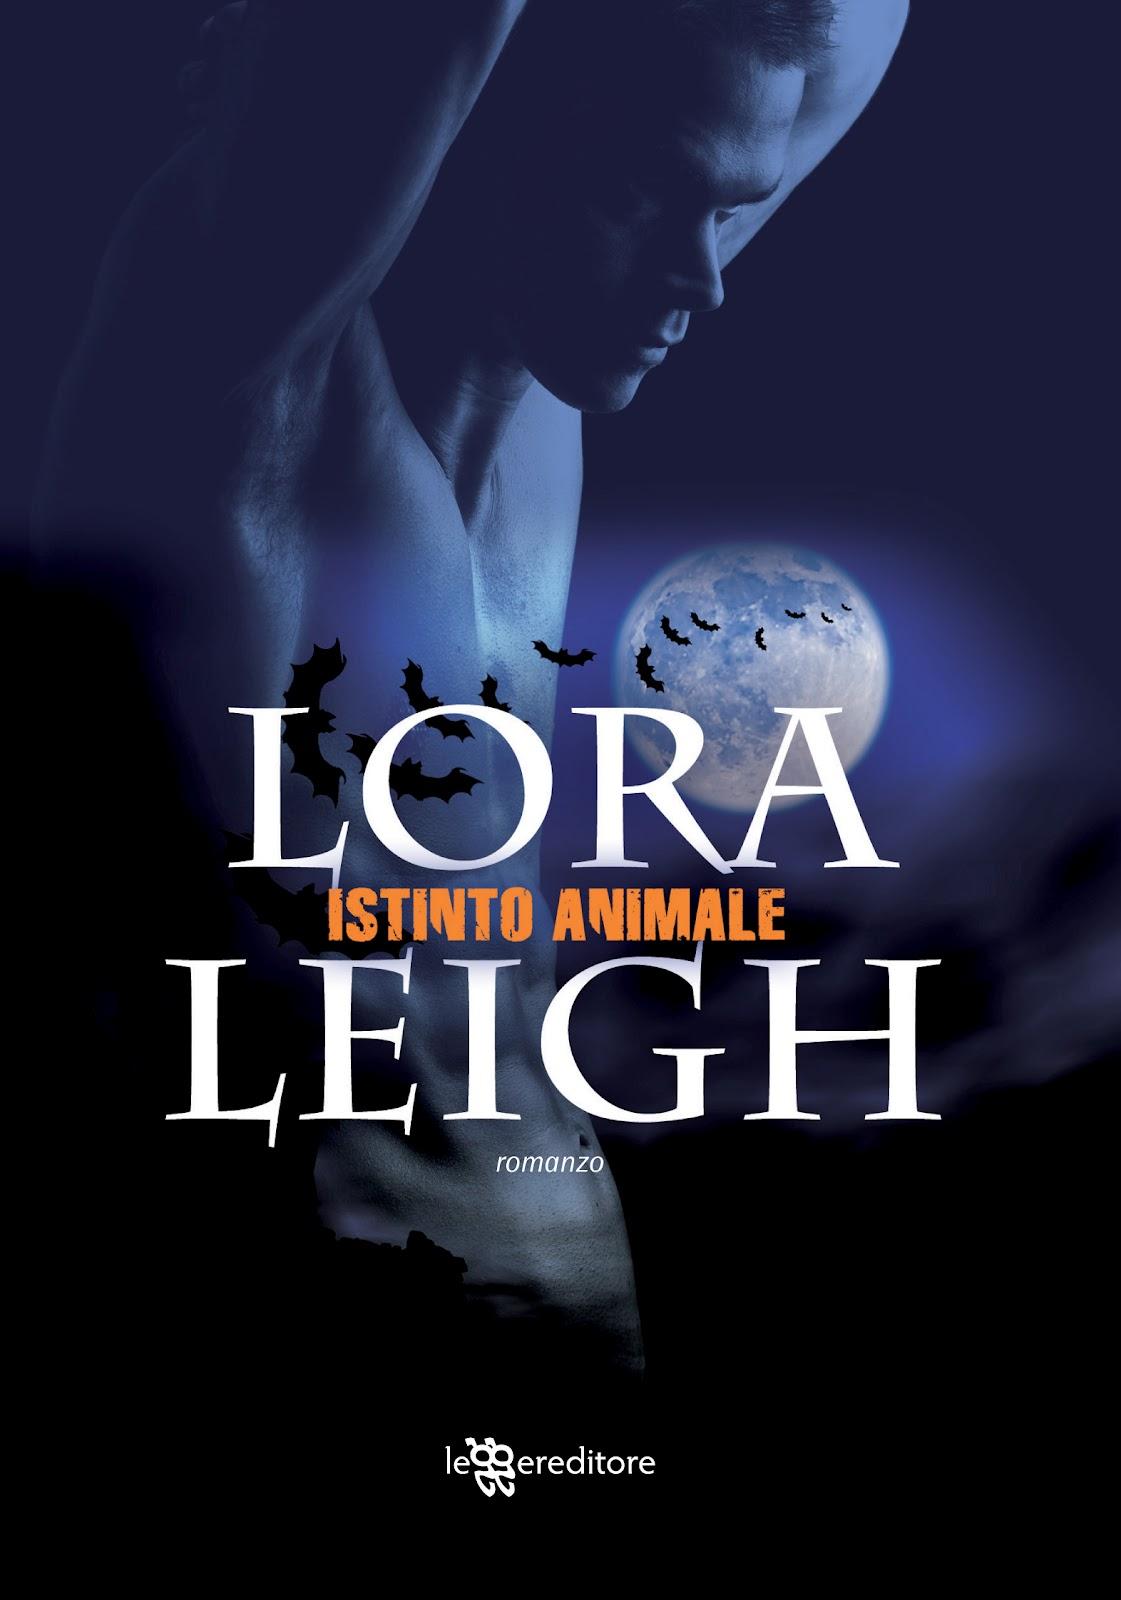 Heart pdf leigh bengals lora